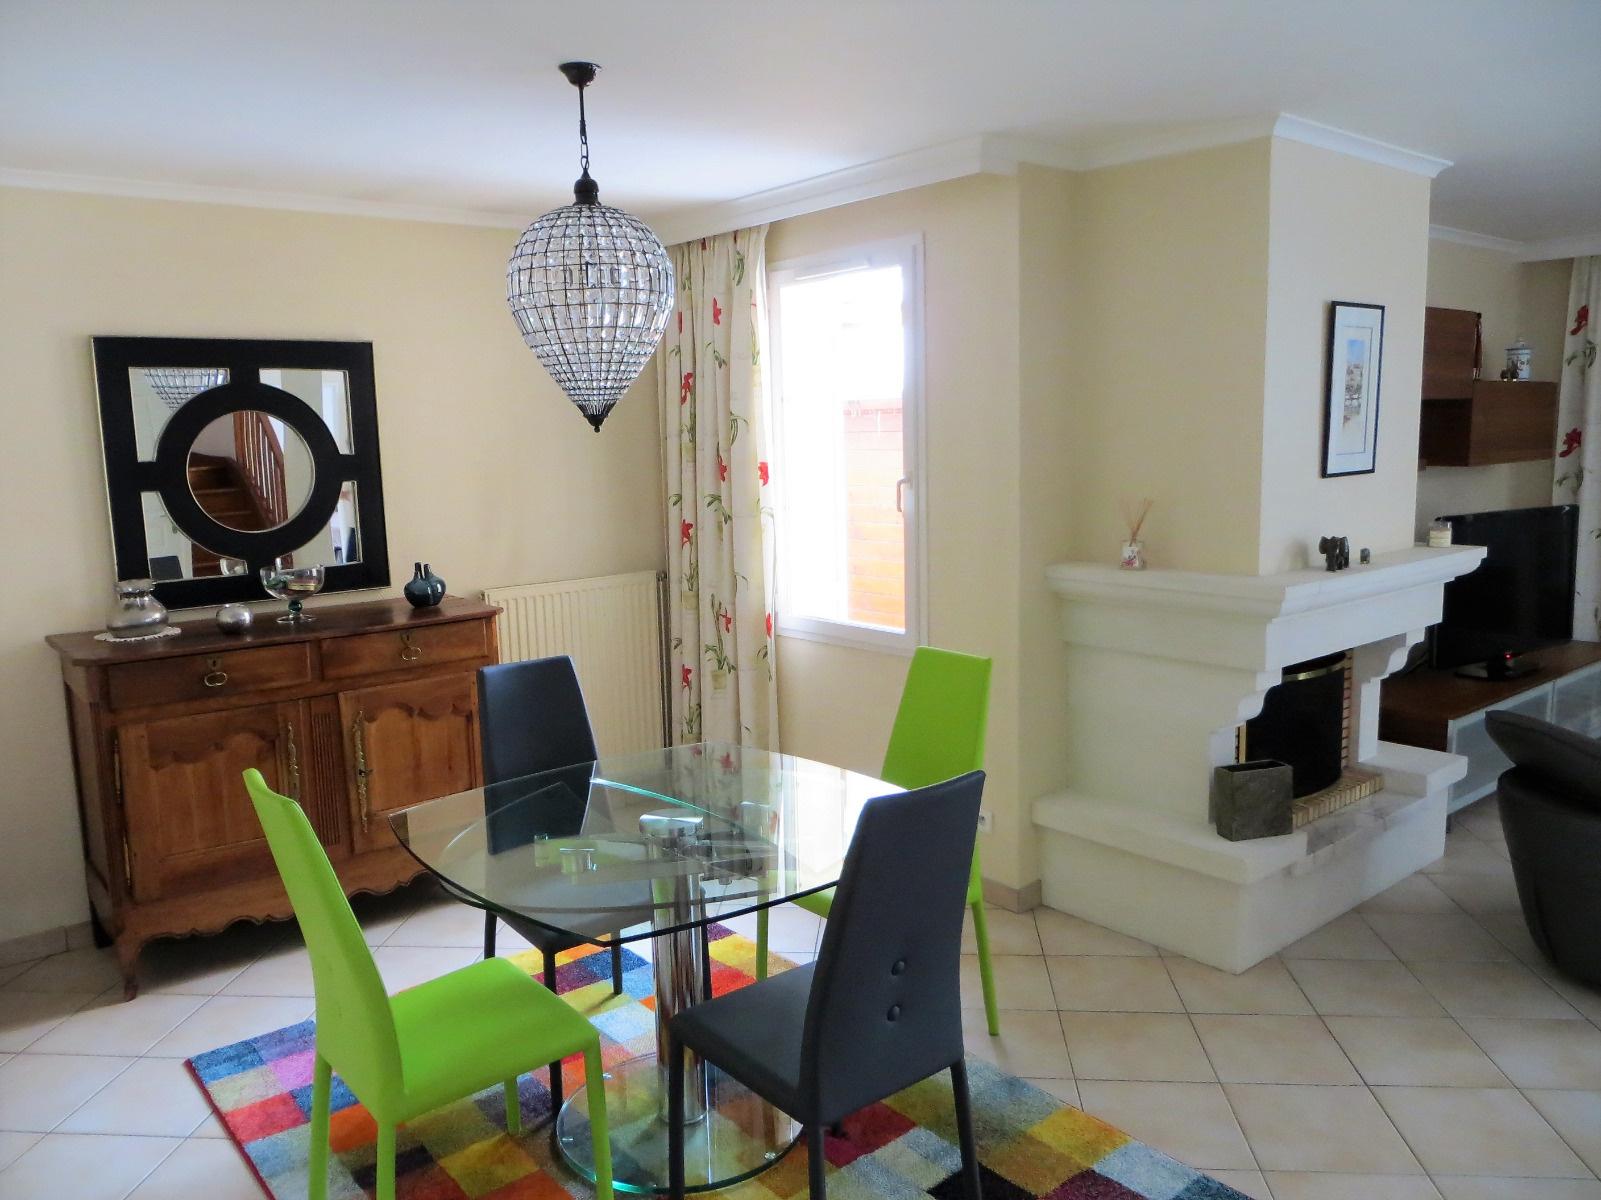 vente maison breguet kaufman. Black Bedroom Furniture Sets. Home Design Ideas